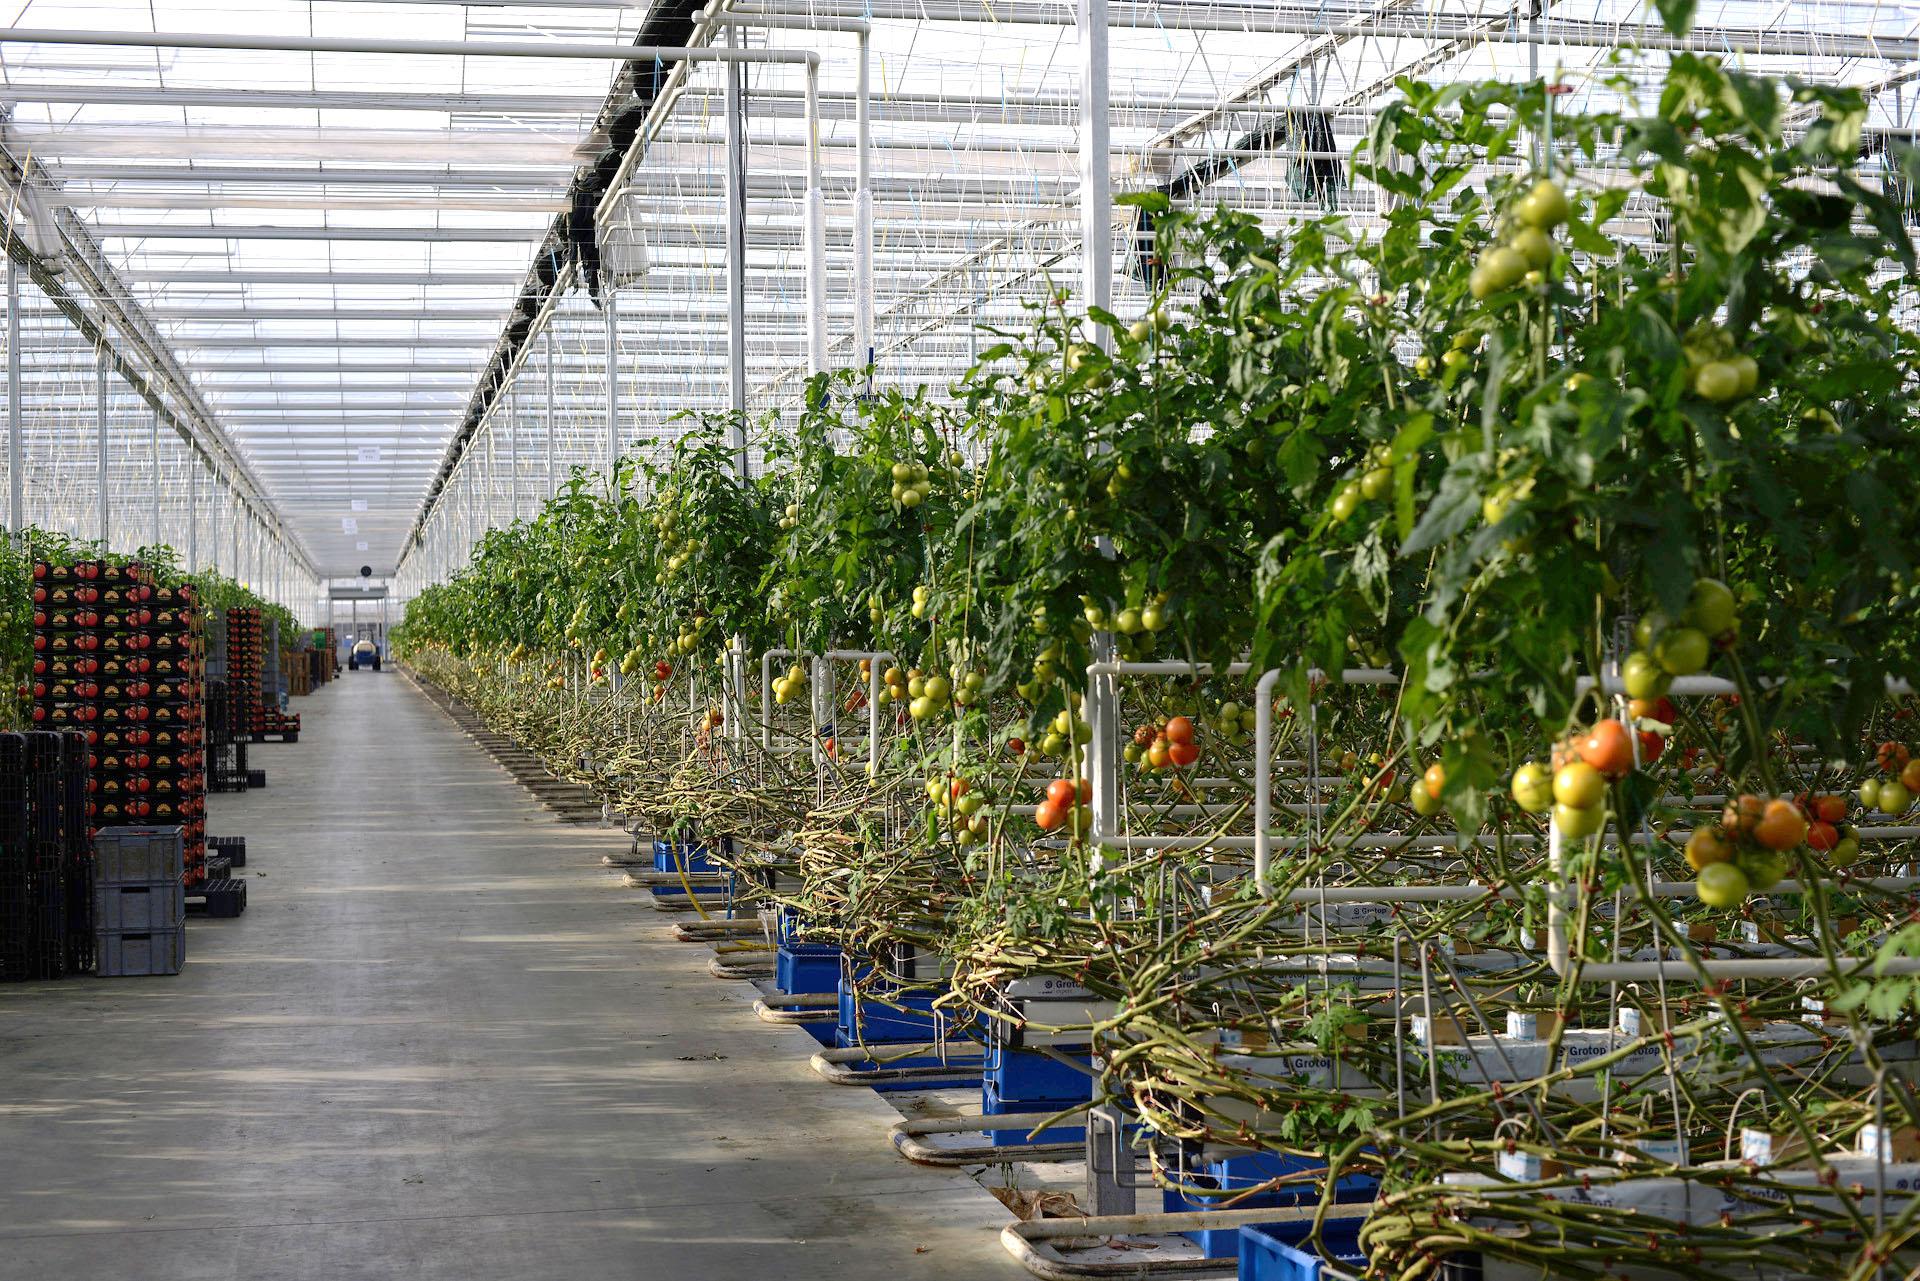 invernaderos-en-polonia-tomate